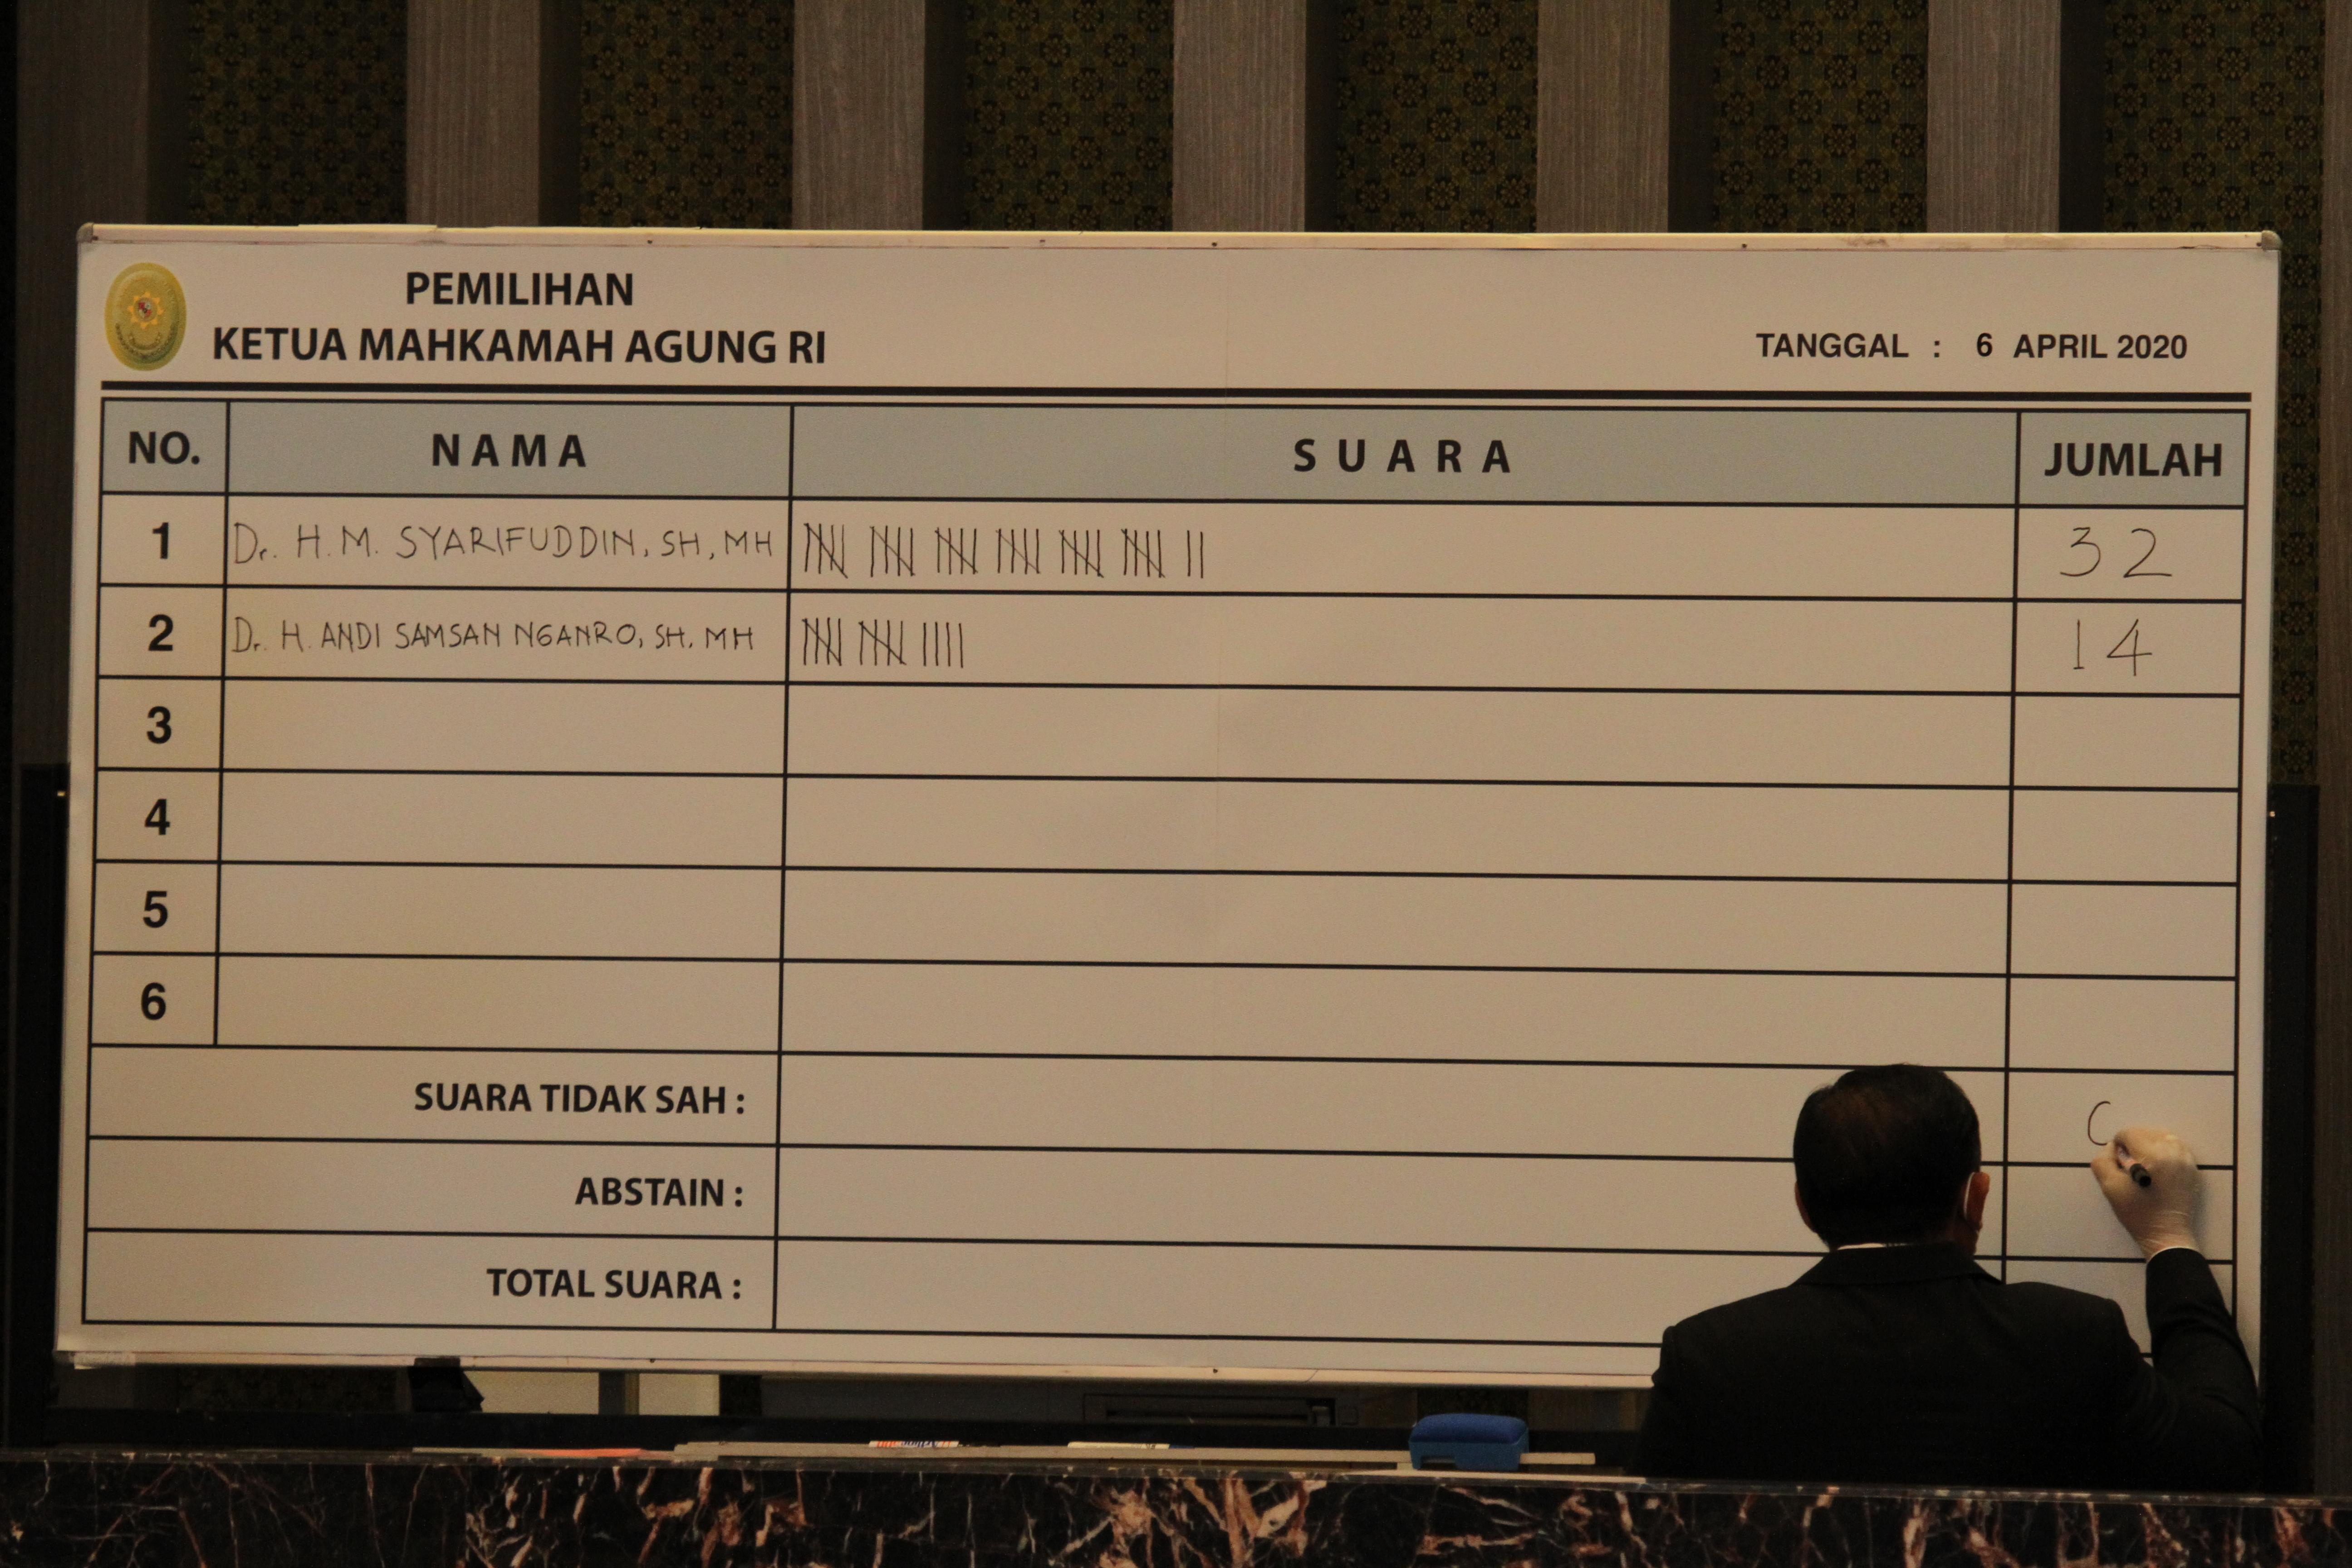 Dr.  SYARIFUDIN TERPILIH MENJADI KETUA MAHKAMAH AGUNG PRIODE 2020-2025